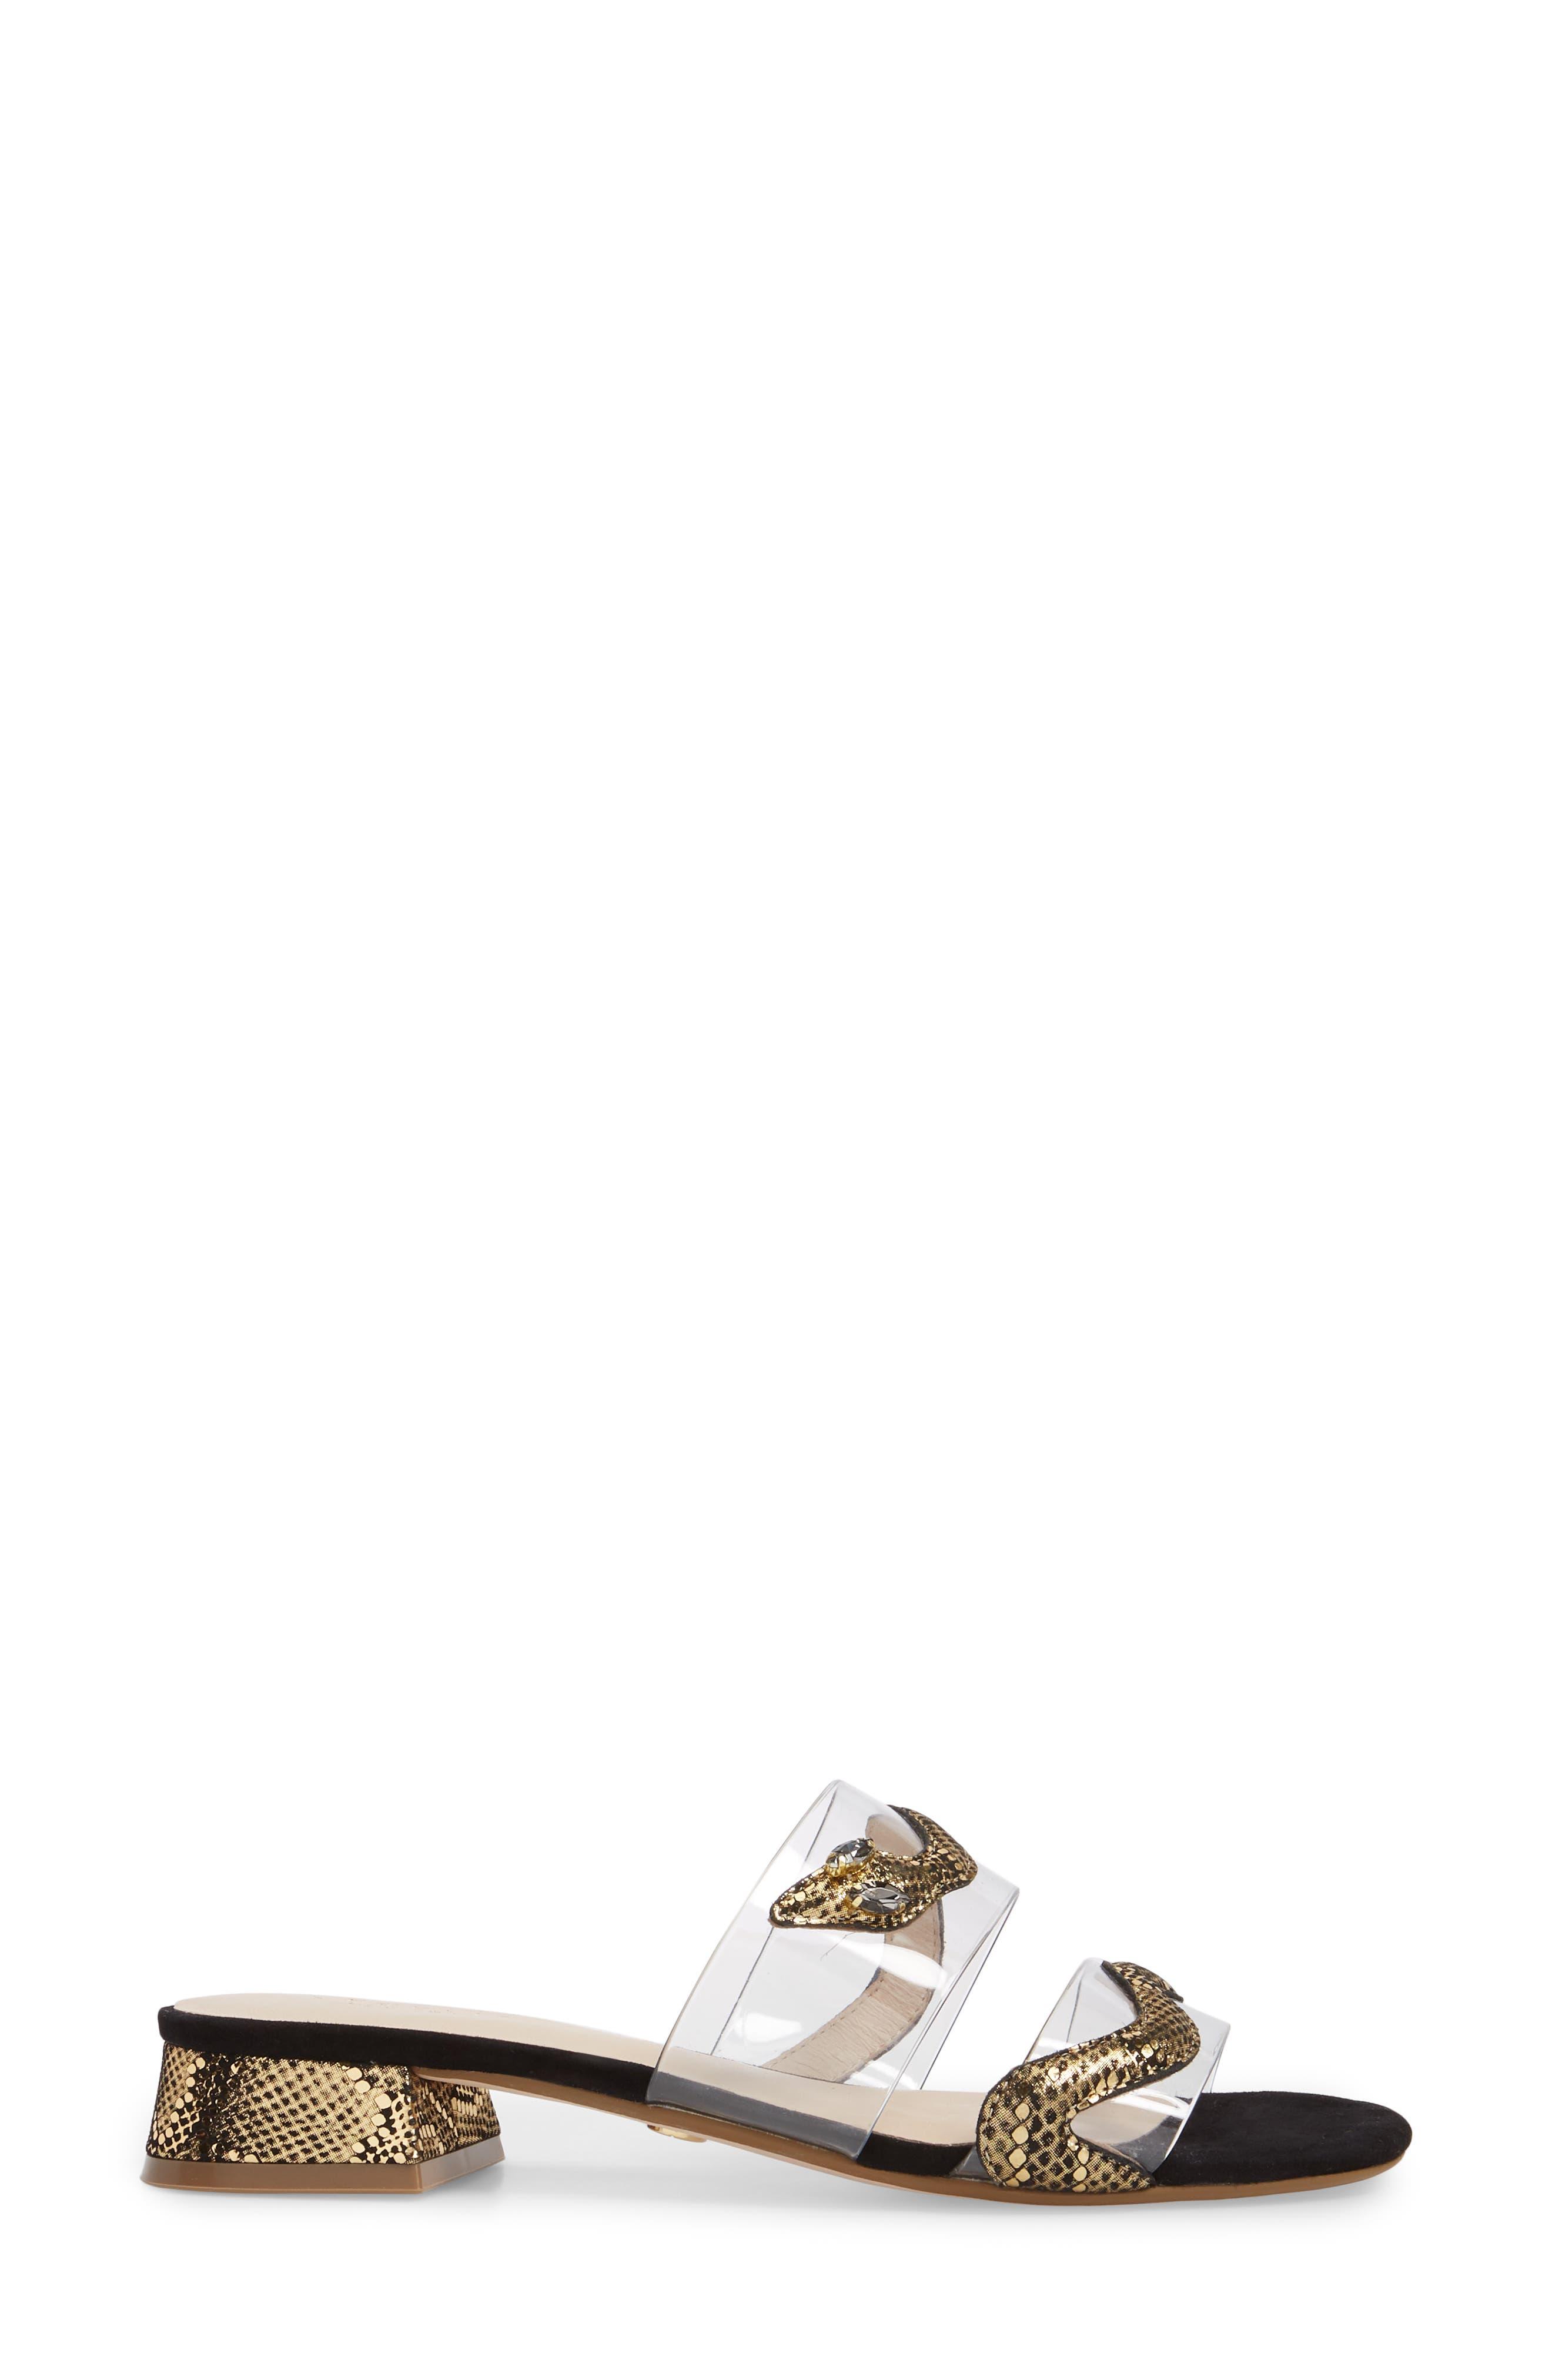 Danica Slide,                             Alternate thumbnail 3, color,                             Gold Print Fabric